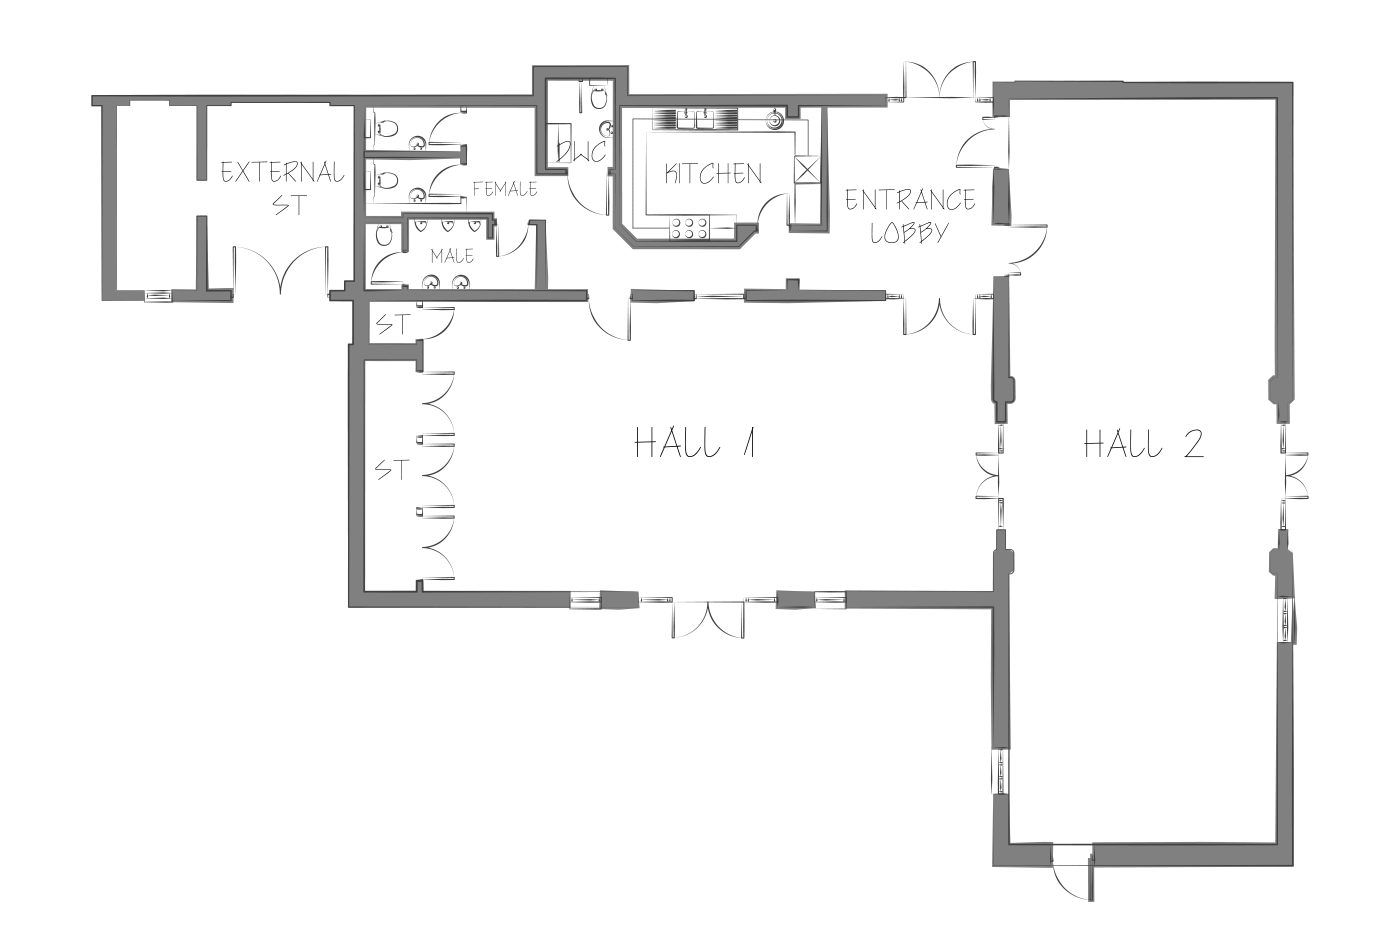 Rectory Farm community centre floor plan